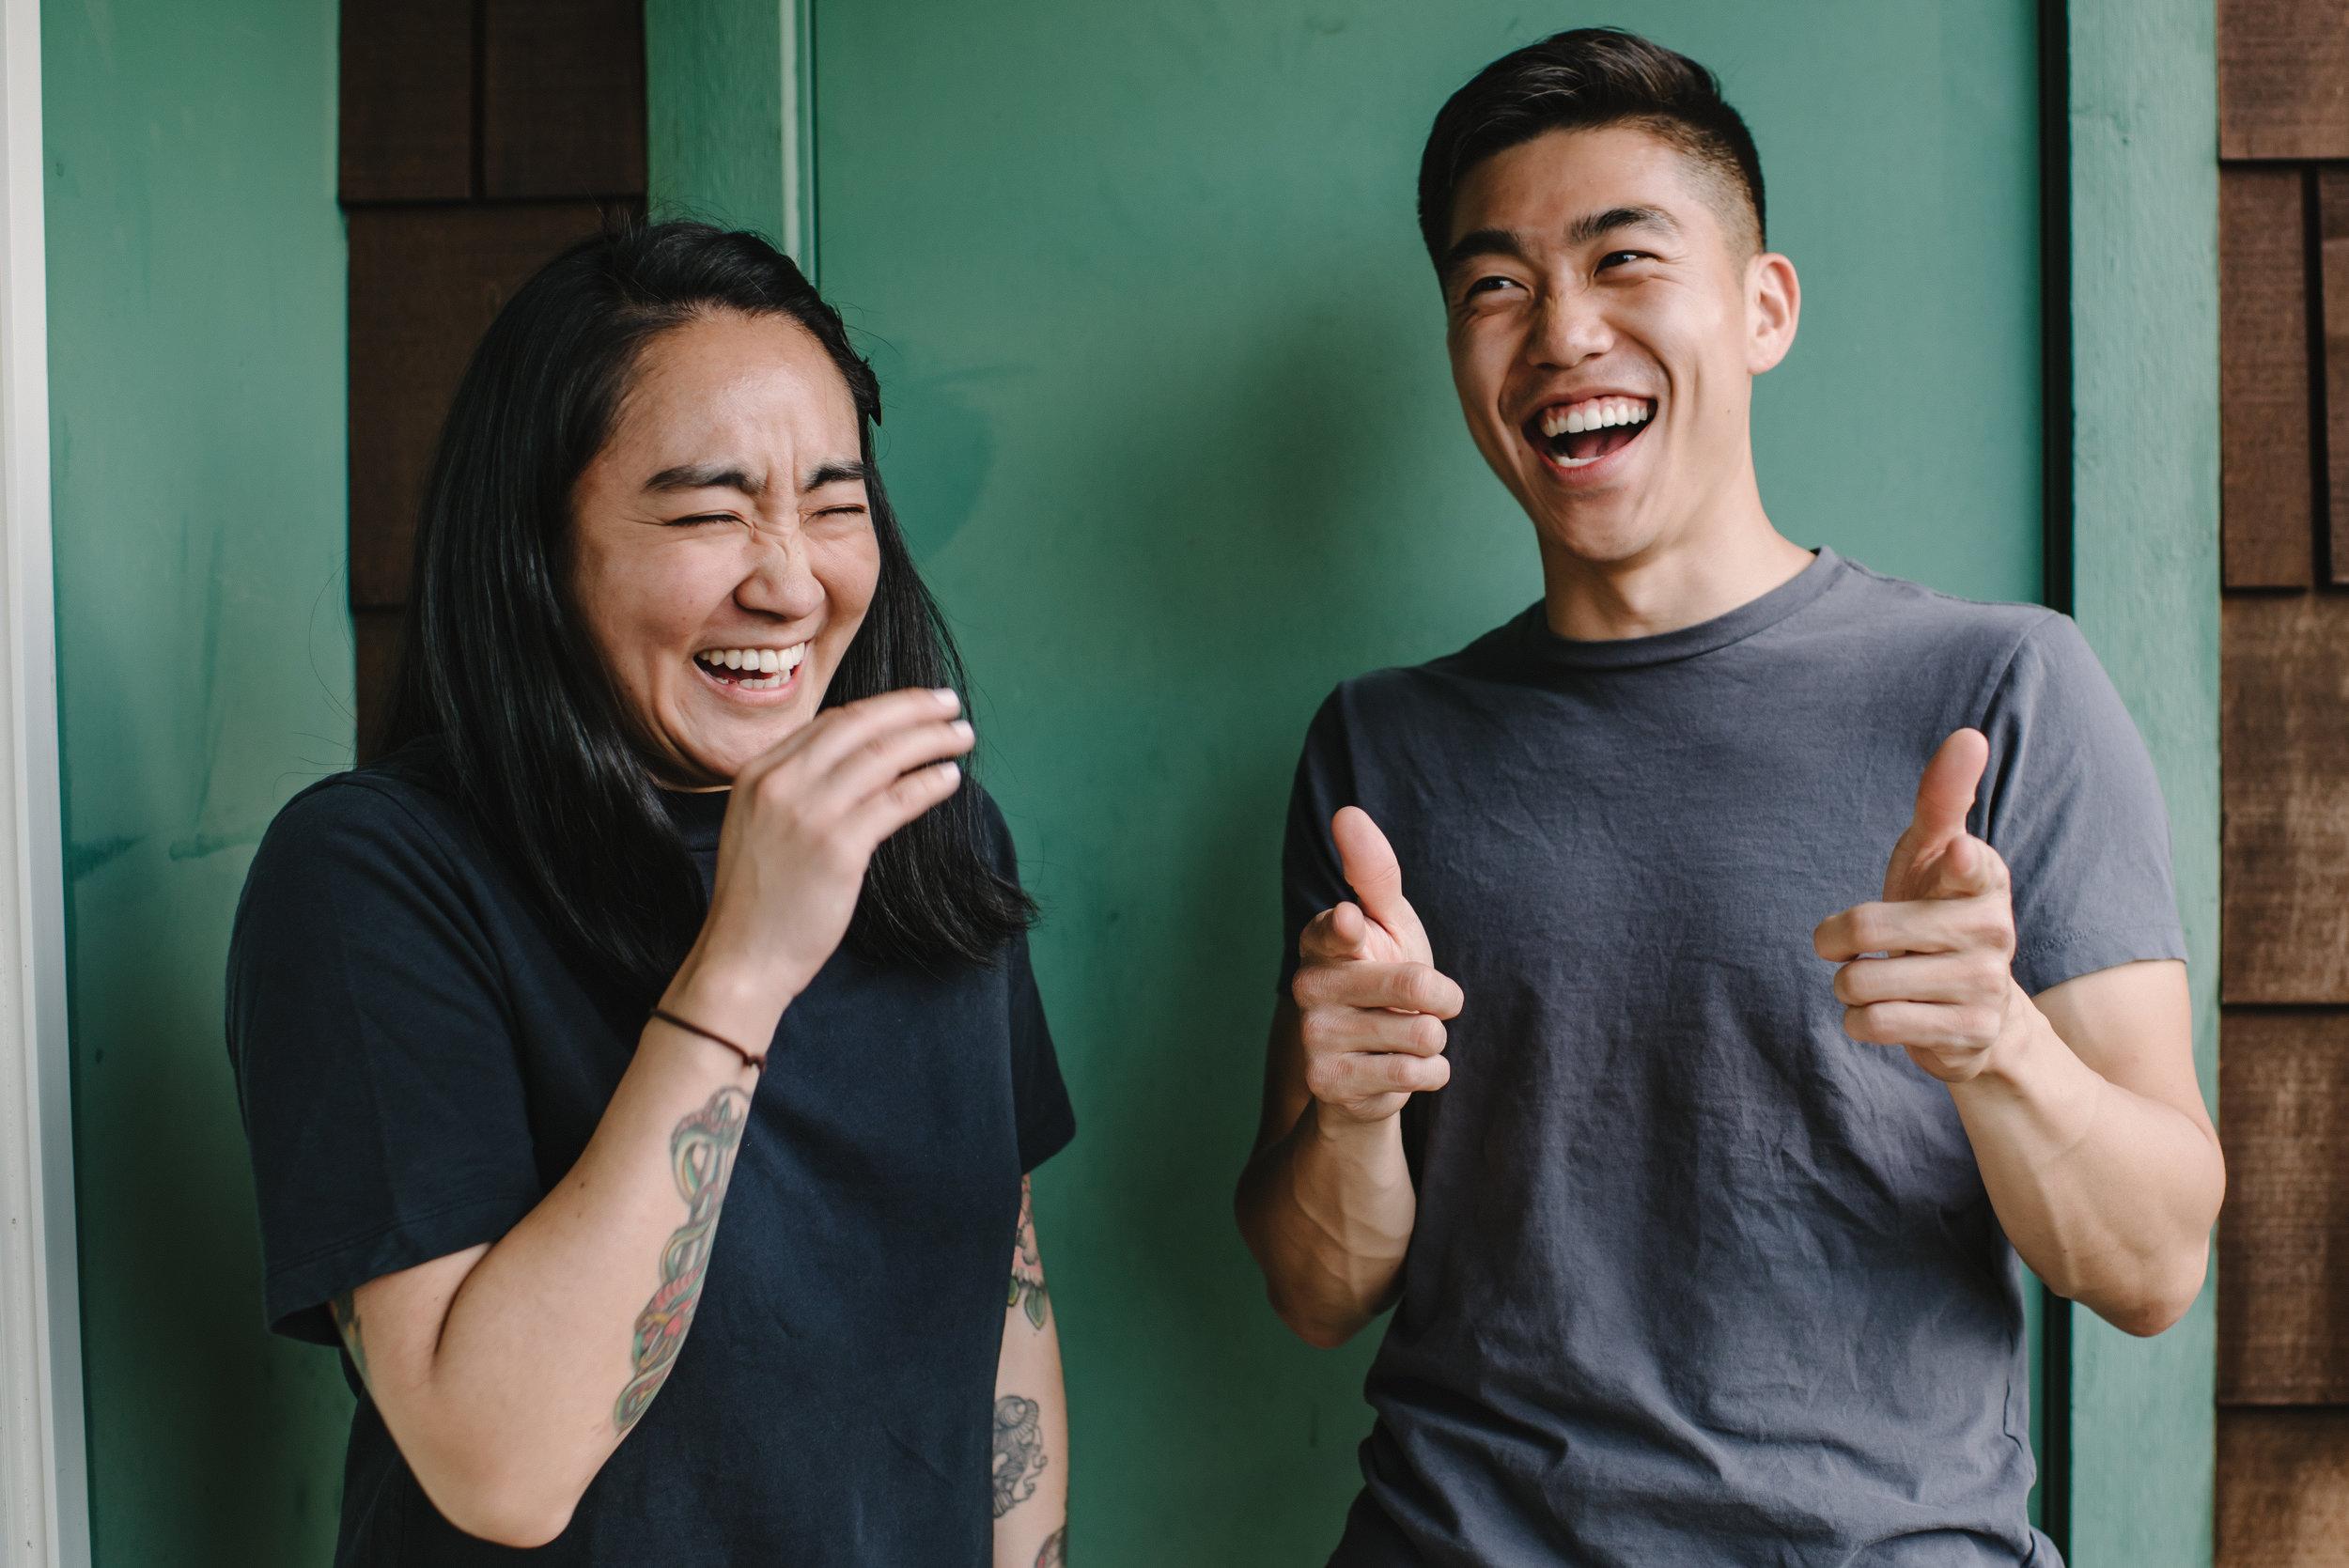 Aya Tiffany Sato, SPAAC Founder with Rev. Thomas Yang, doing finger guns / Photo by Jenny HJ Kim